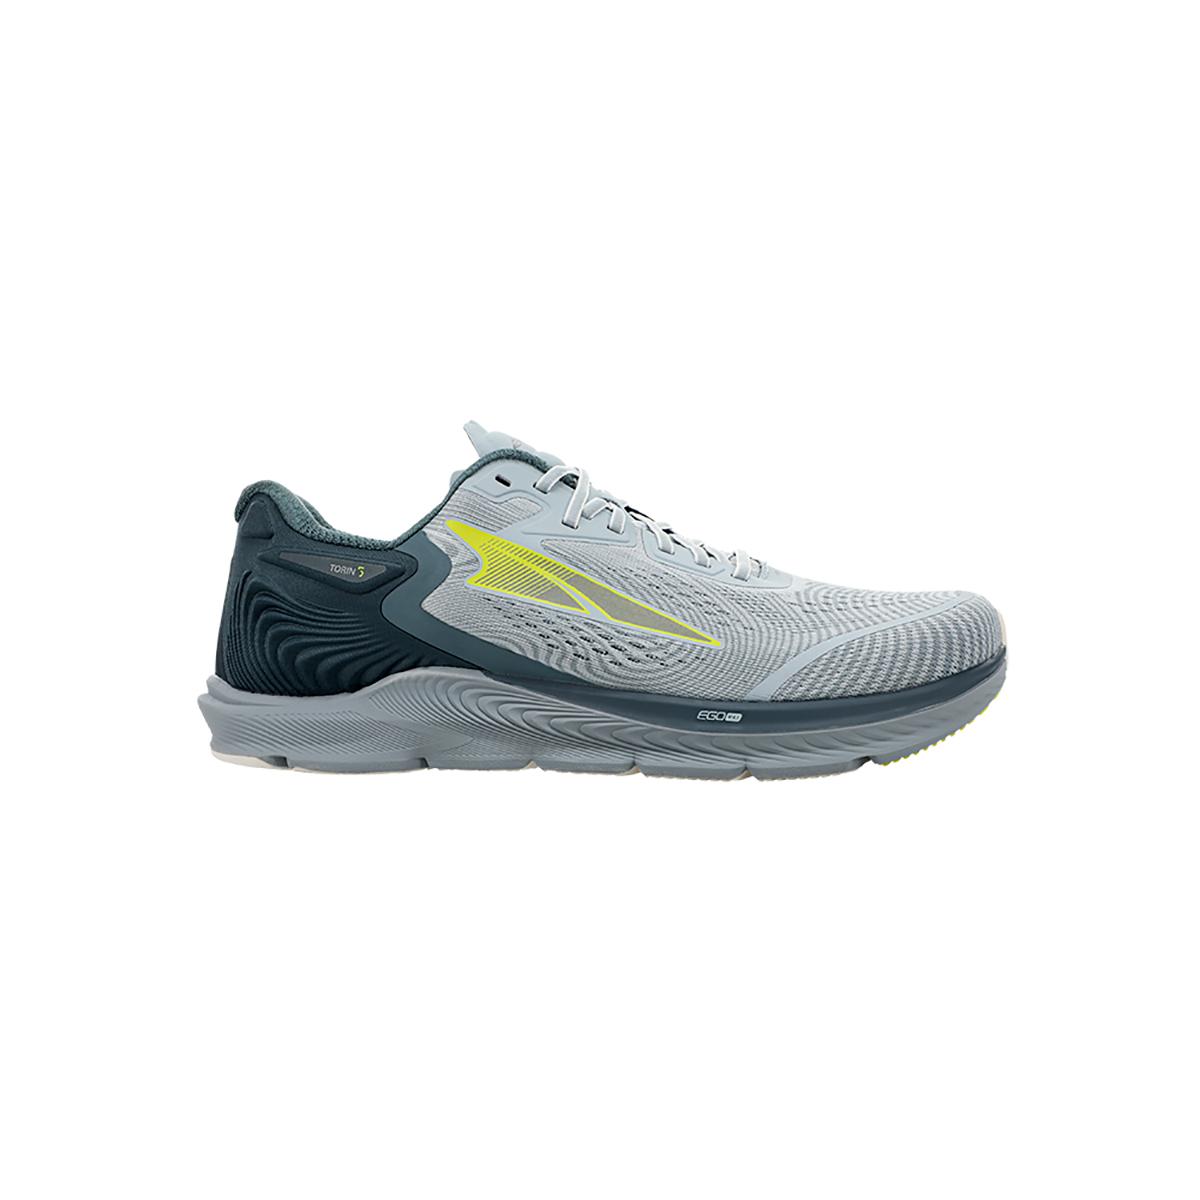 Men's Altra Torin 5 Running Shoe - Color: Gray/Lime - Size: 7 - Width: Regular, Gray/Lime, large, image 1